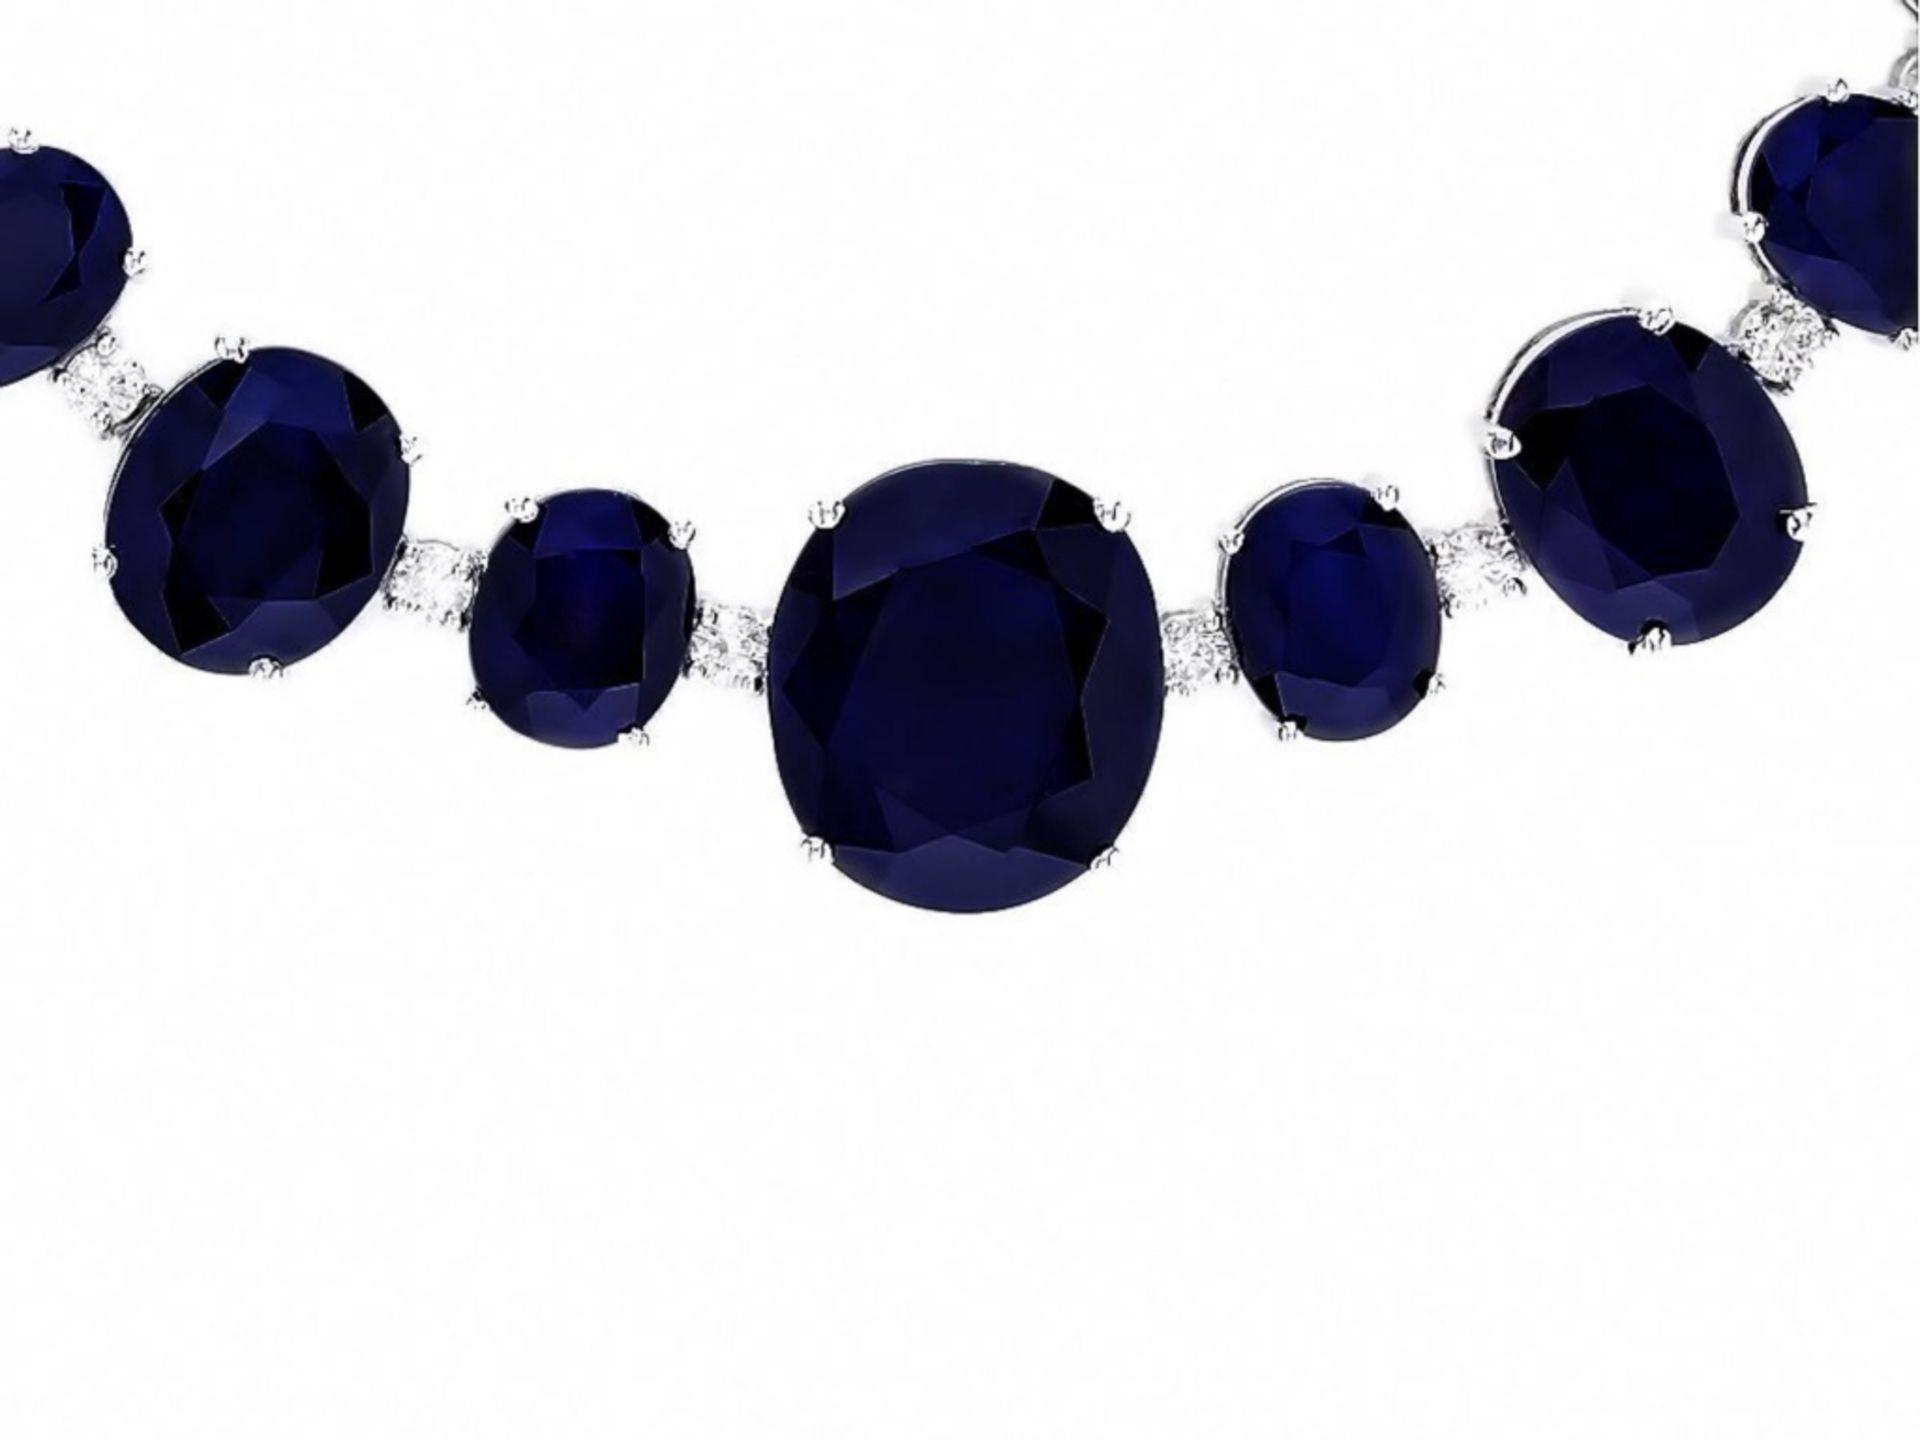 `14k Gold 170.00ct Sapphire & 2.00ct Diamond Neckl - Image 4 of 5